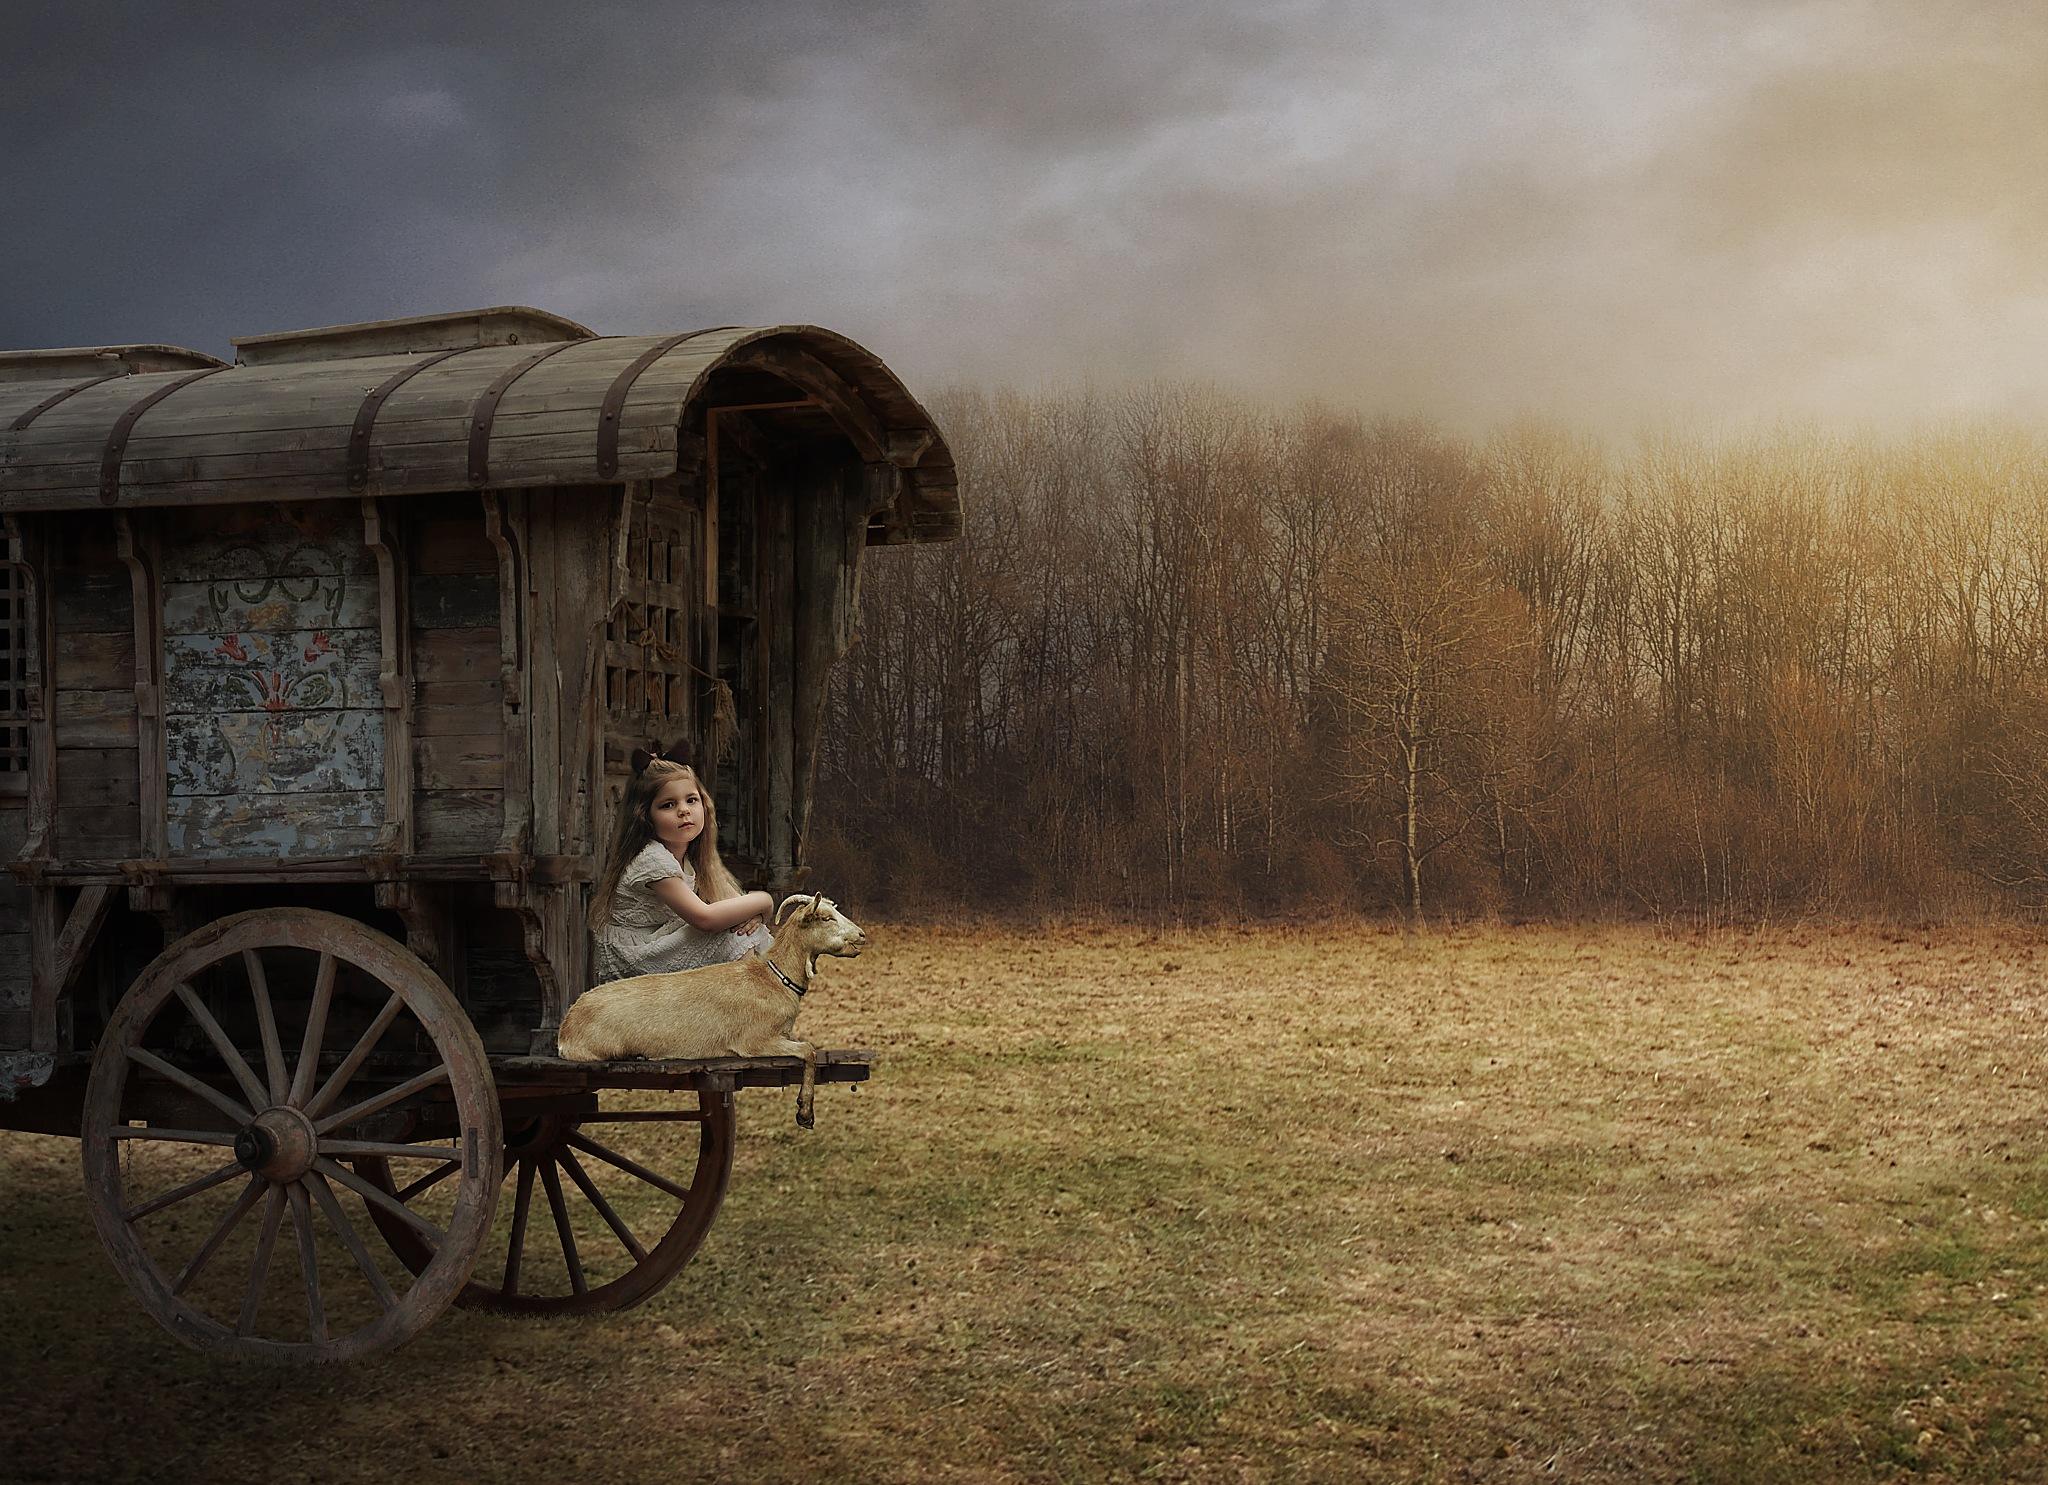 TRAVELING COMPANIONS by VJEKO